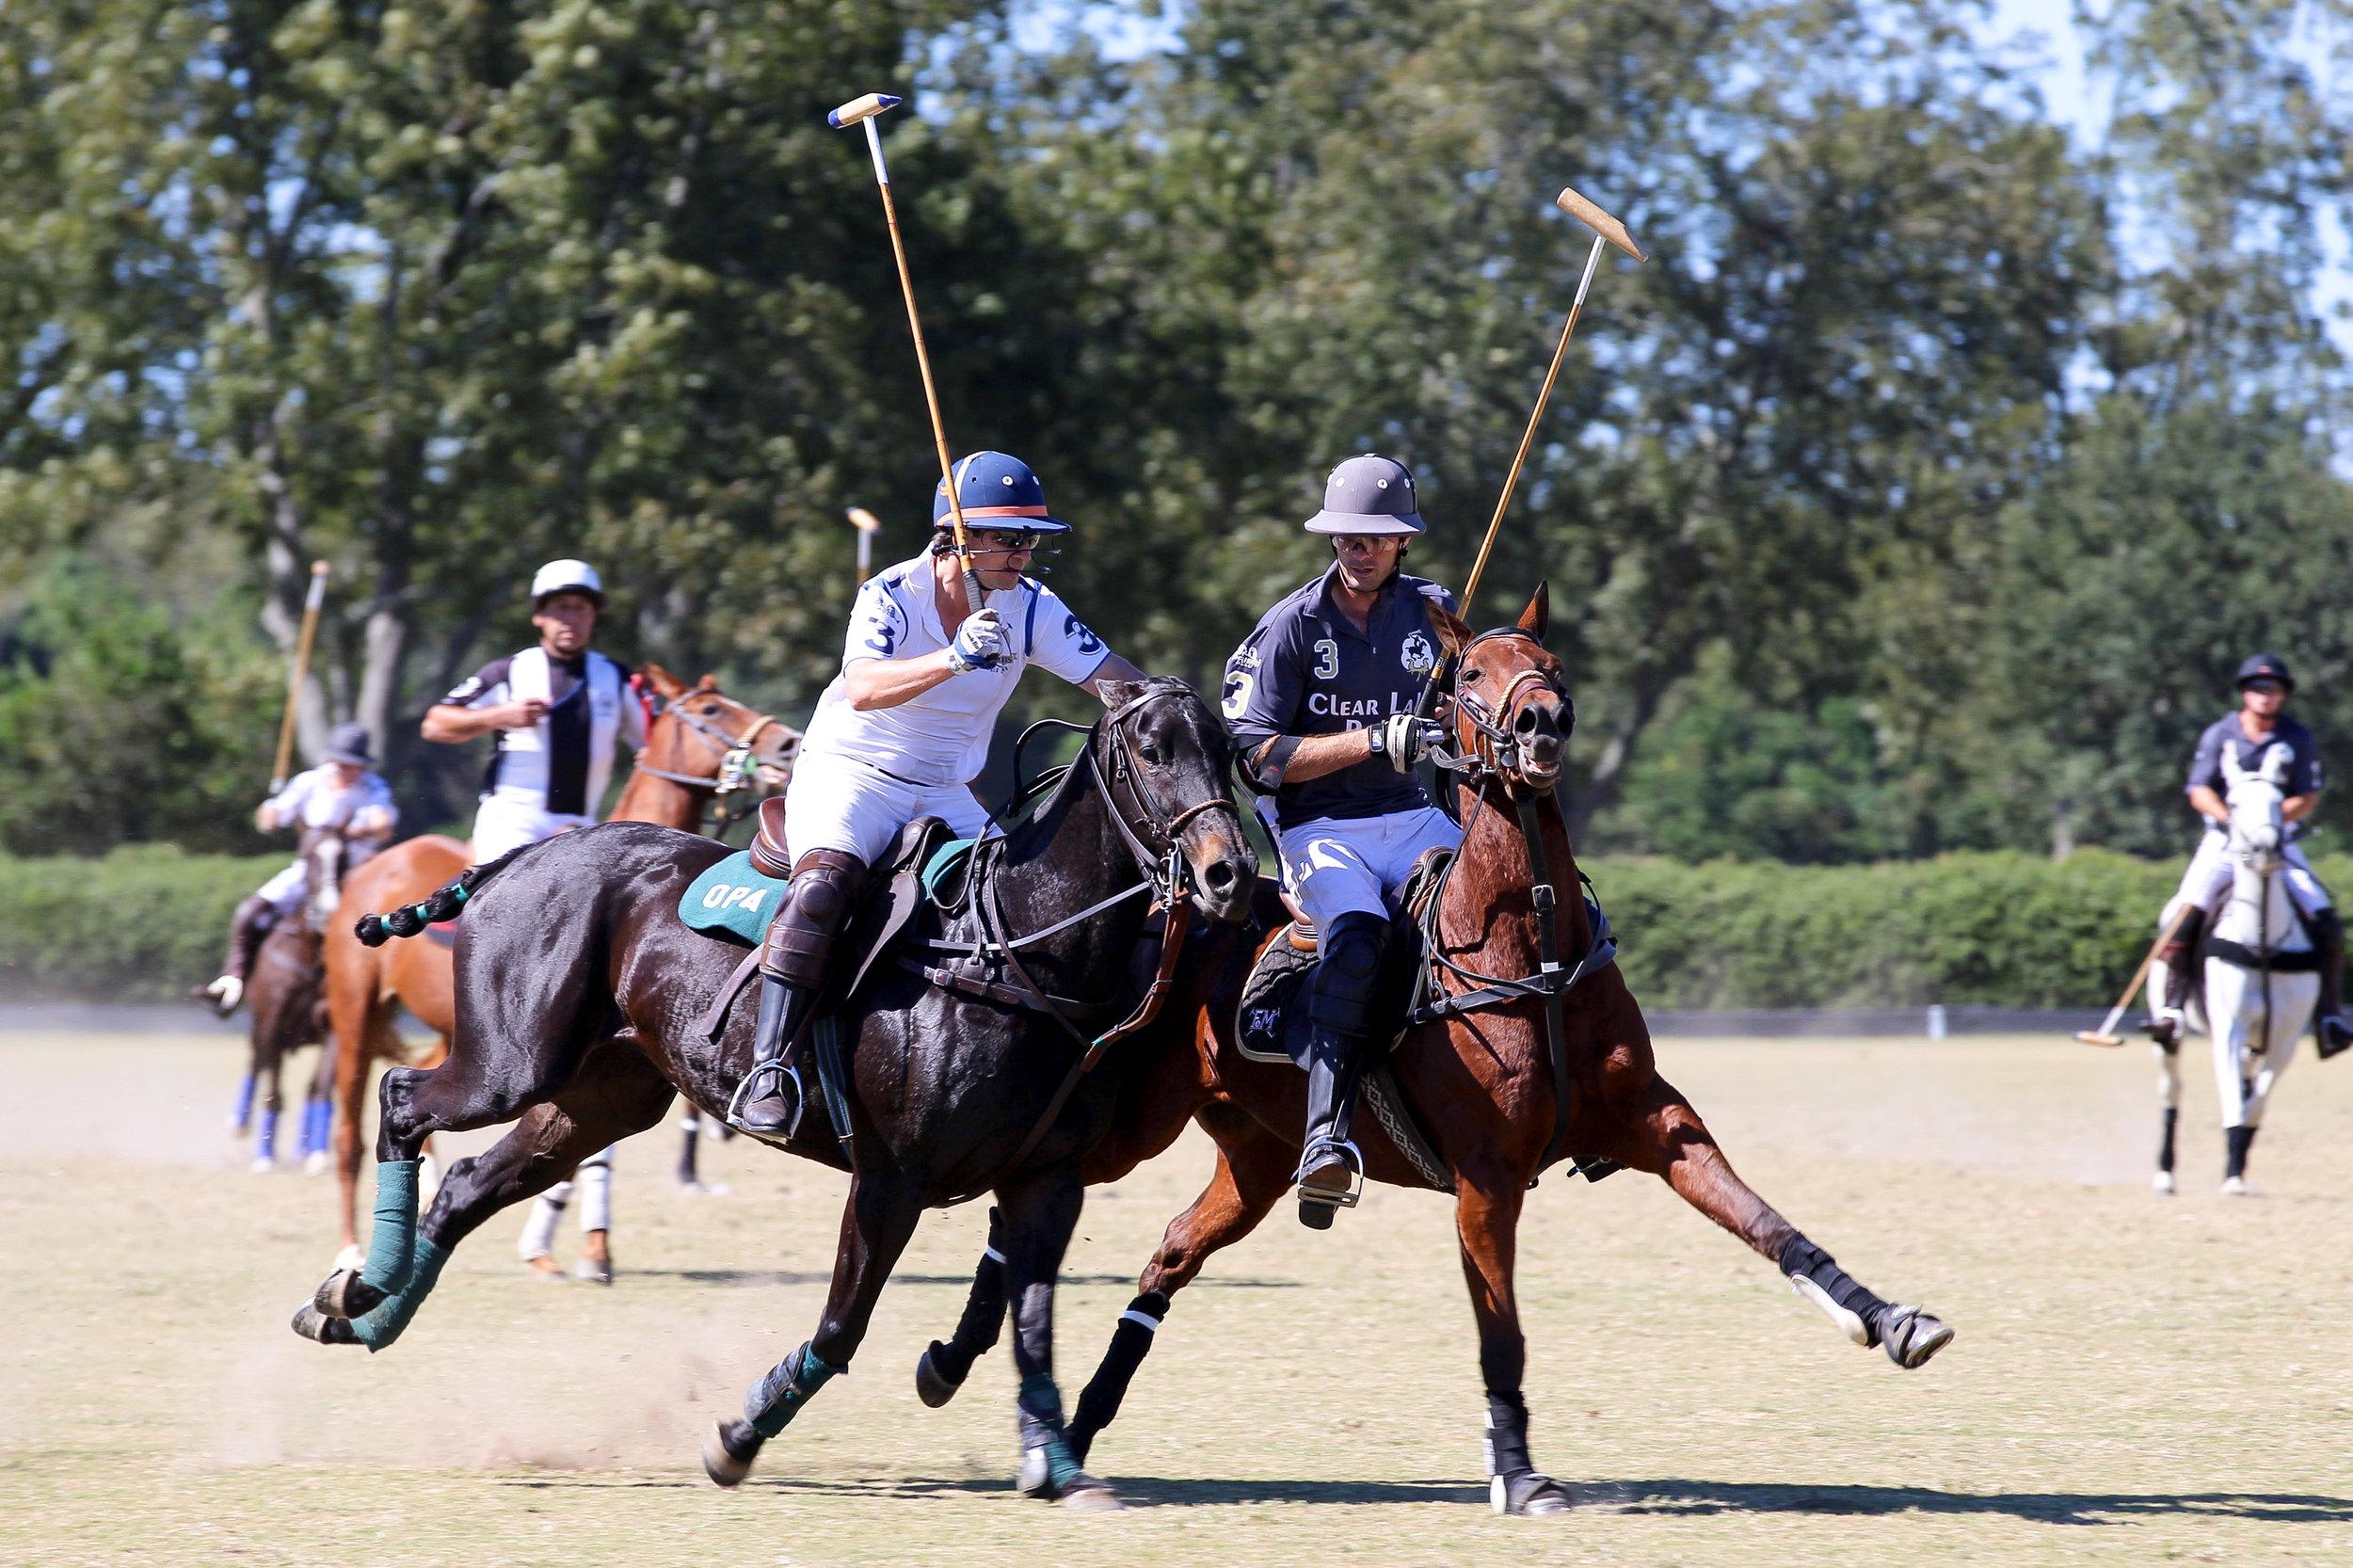 fashion blogger lcb style horse polo fall fashion (1 of 7).jpg